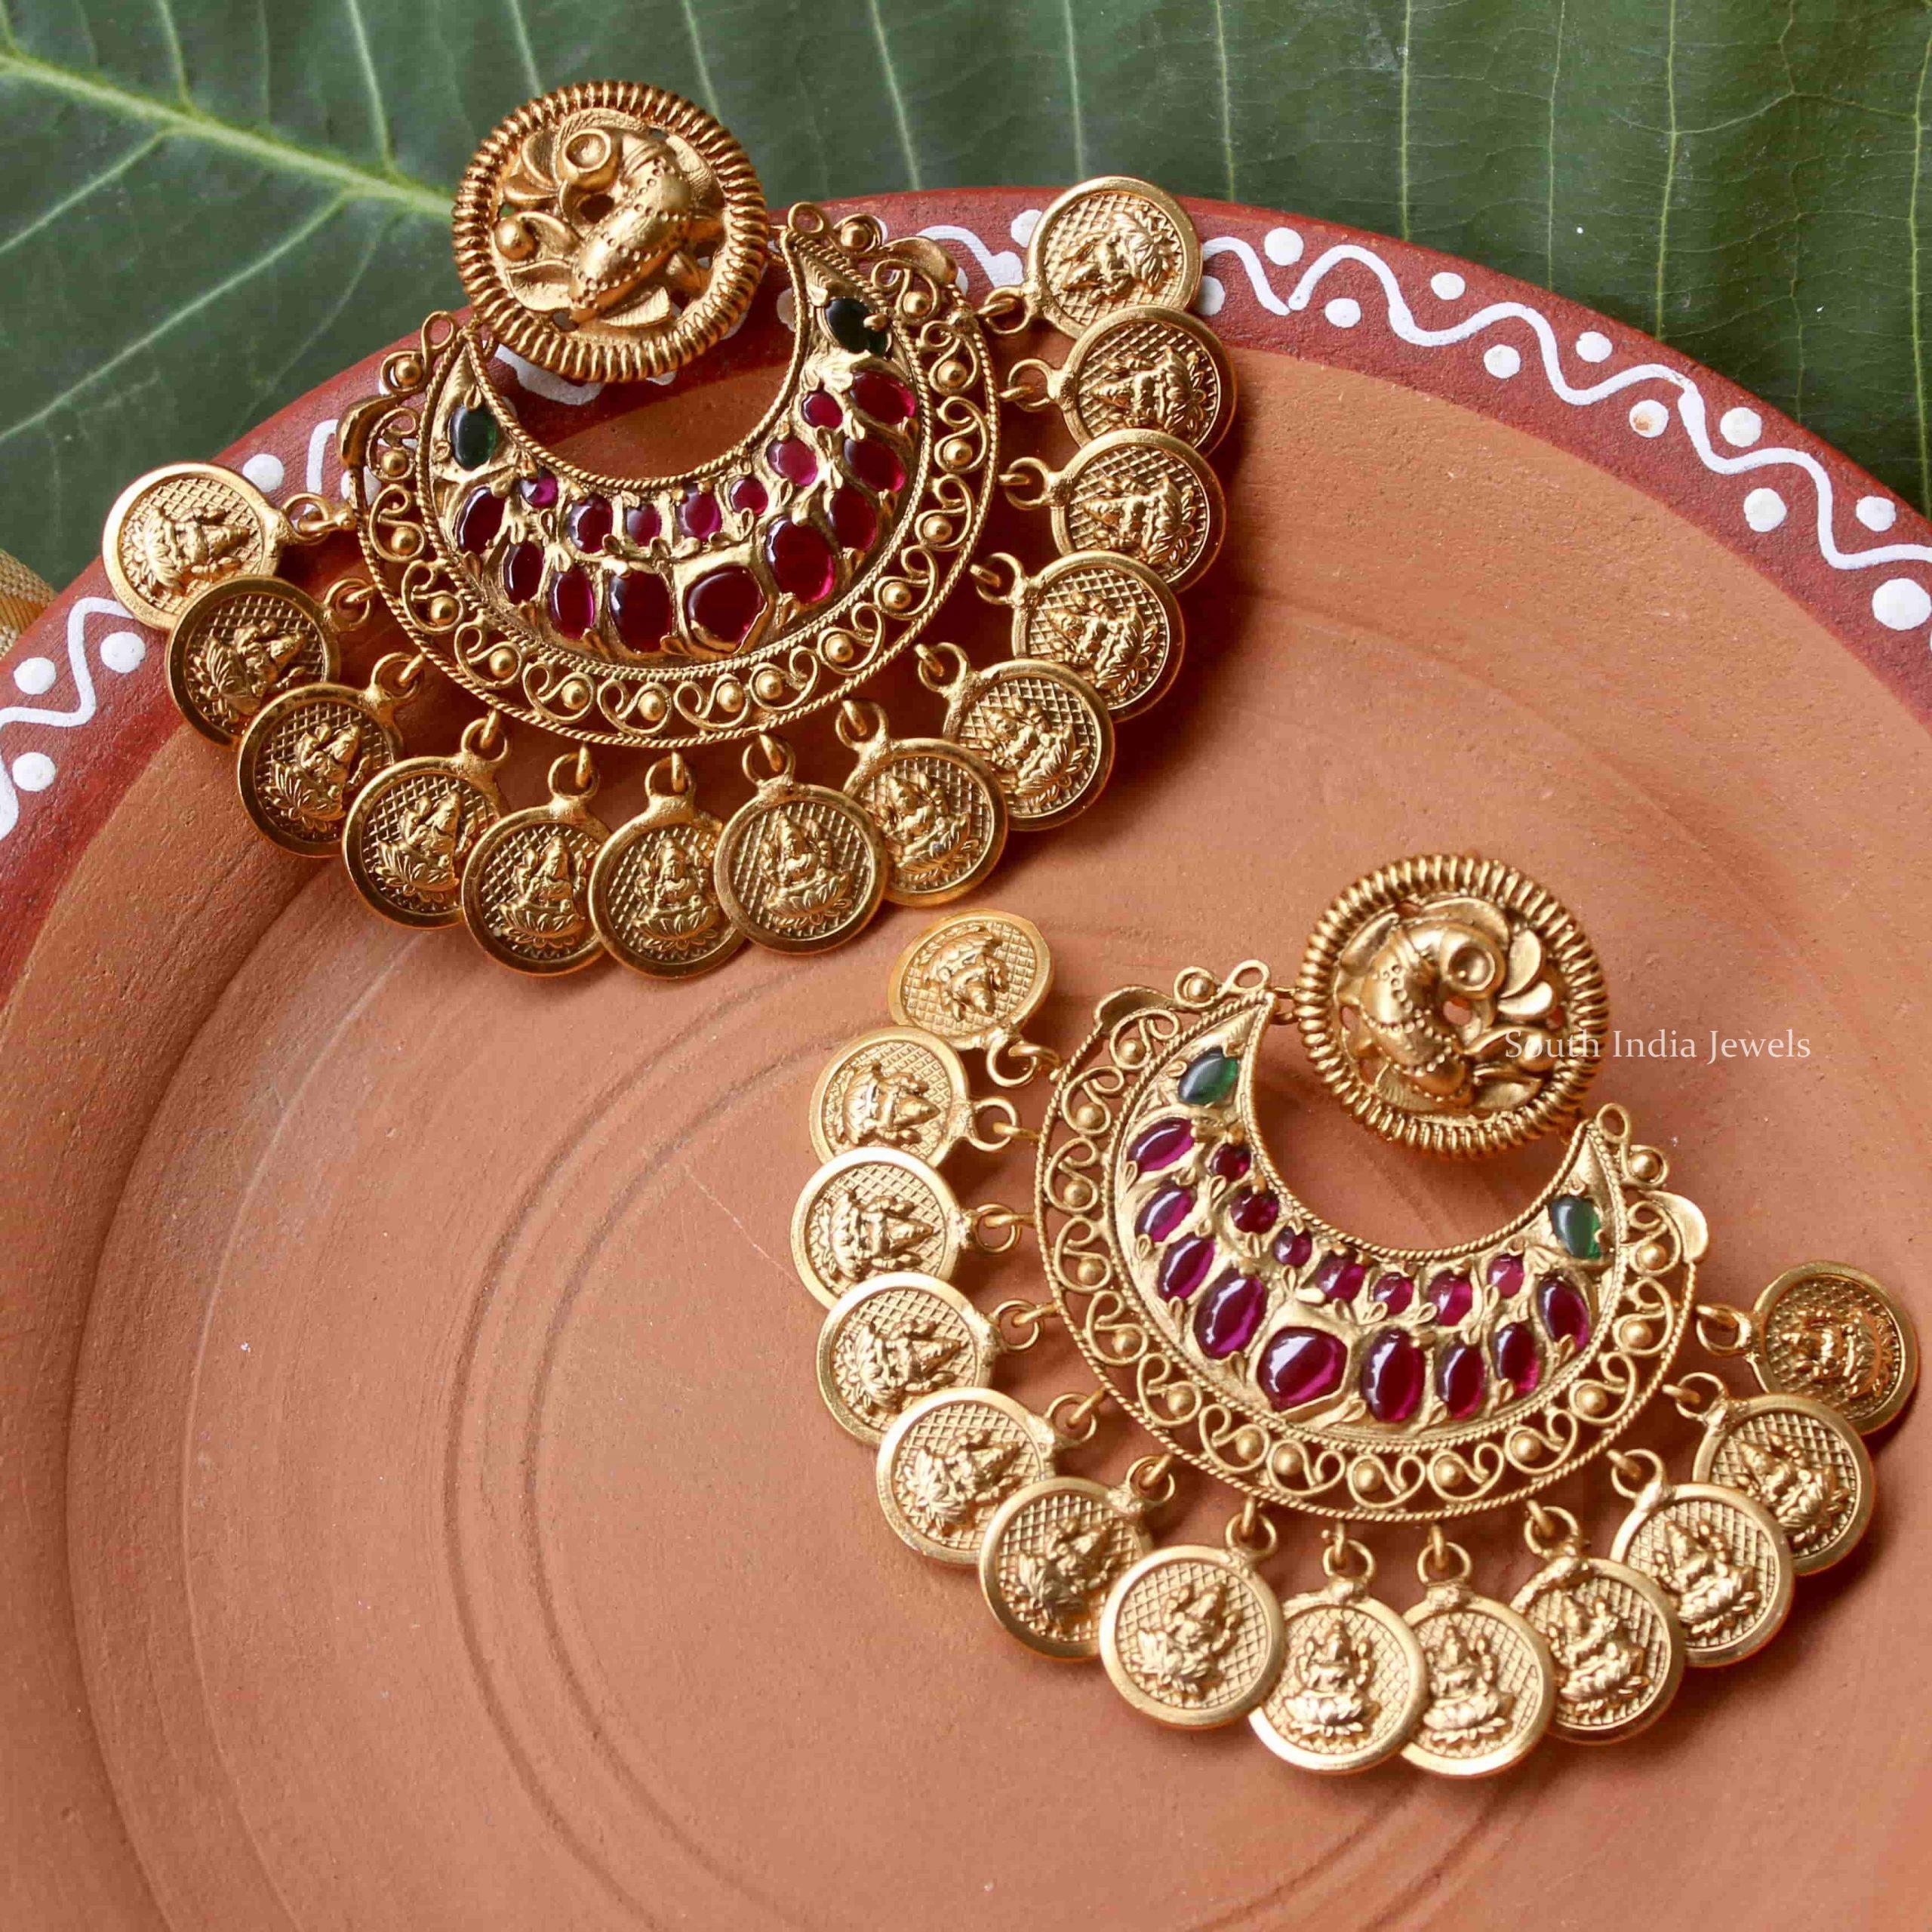 Grand-Peacock-Design-Lakshmi-Coin-Earrings-01-scaled